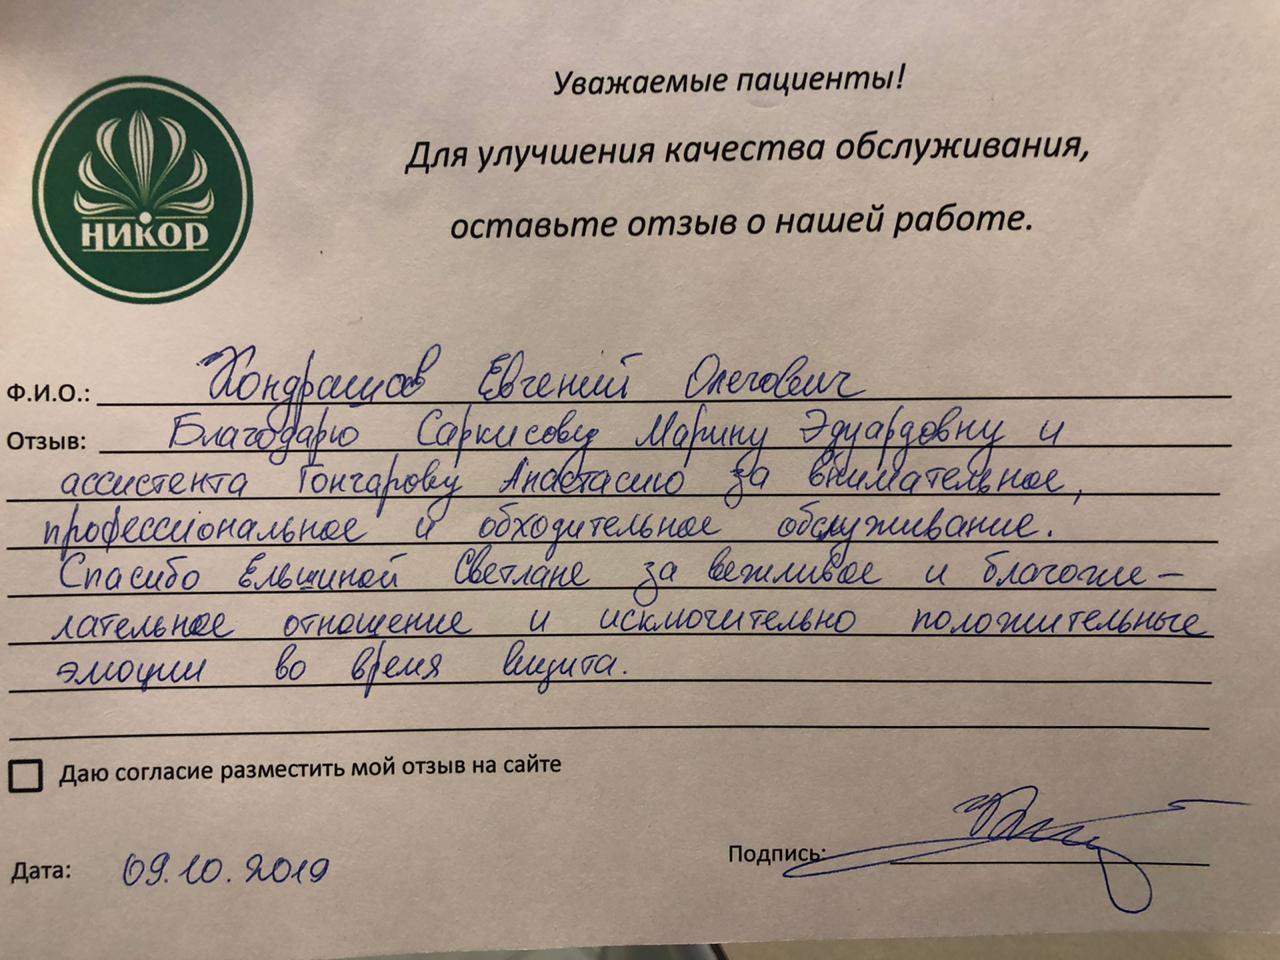 Евгений Олегович К.